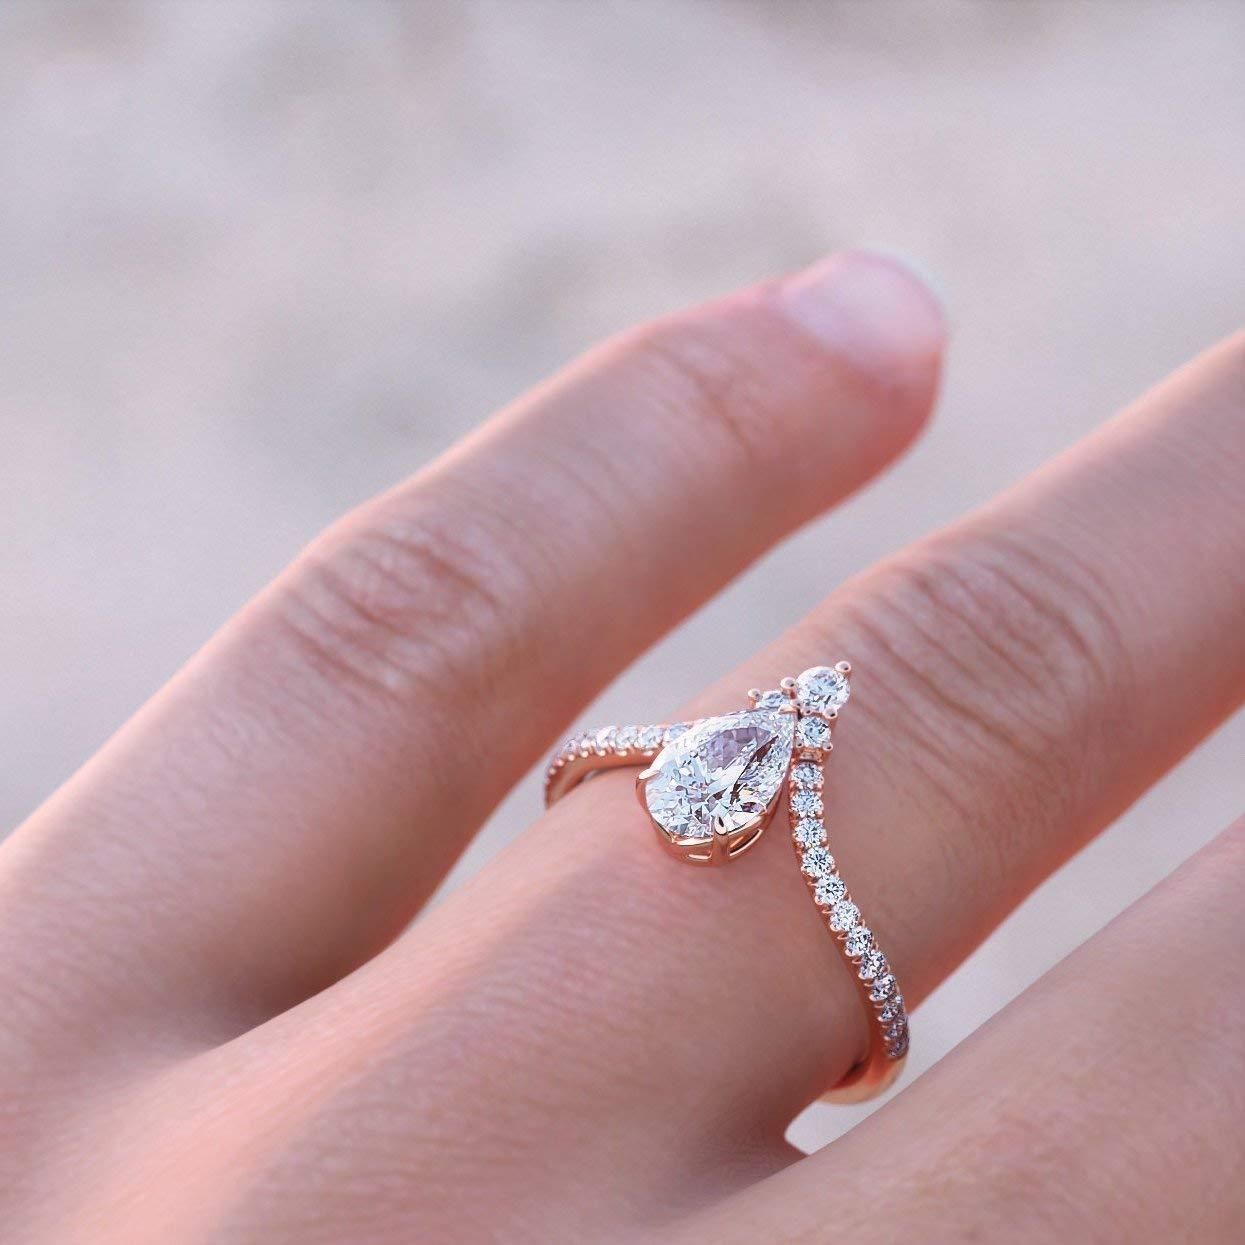 Genuine Pave Diamond Wedding Chevron Ring Solid 14k Rose Gold MINIMALIST Jewelry